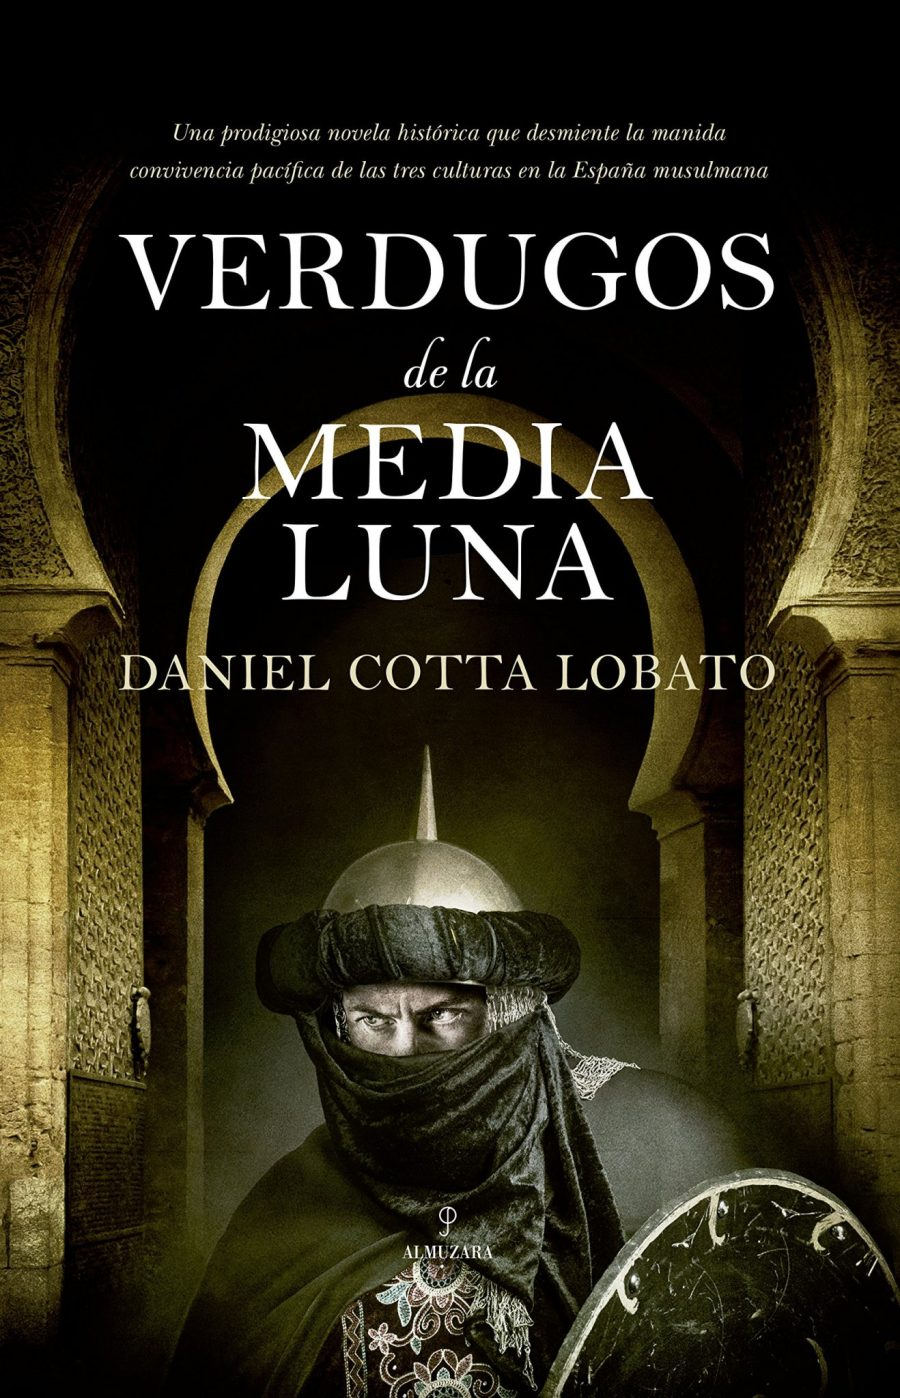 Verdugos de la media luna Book Cover